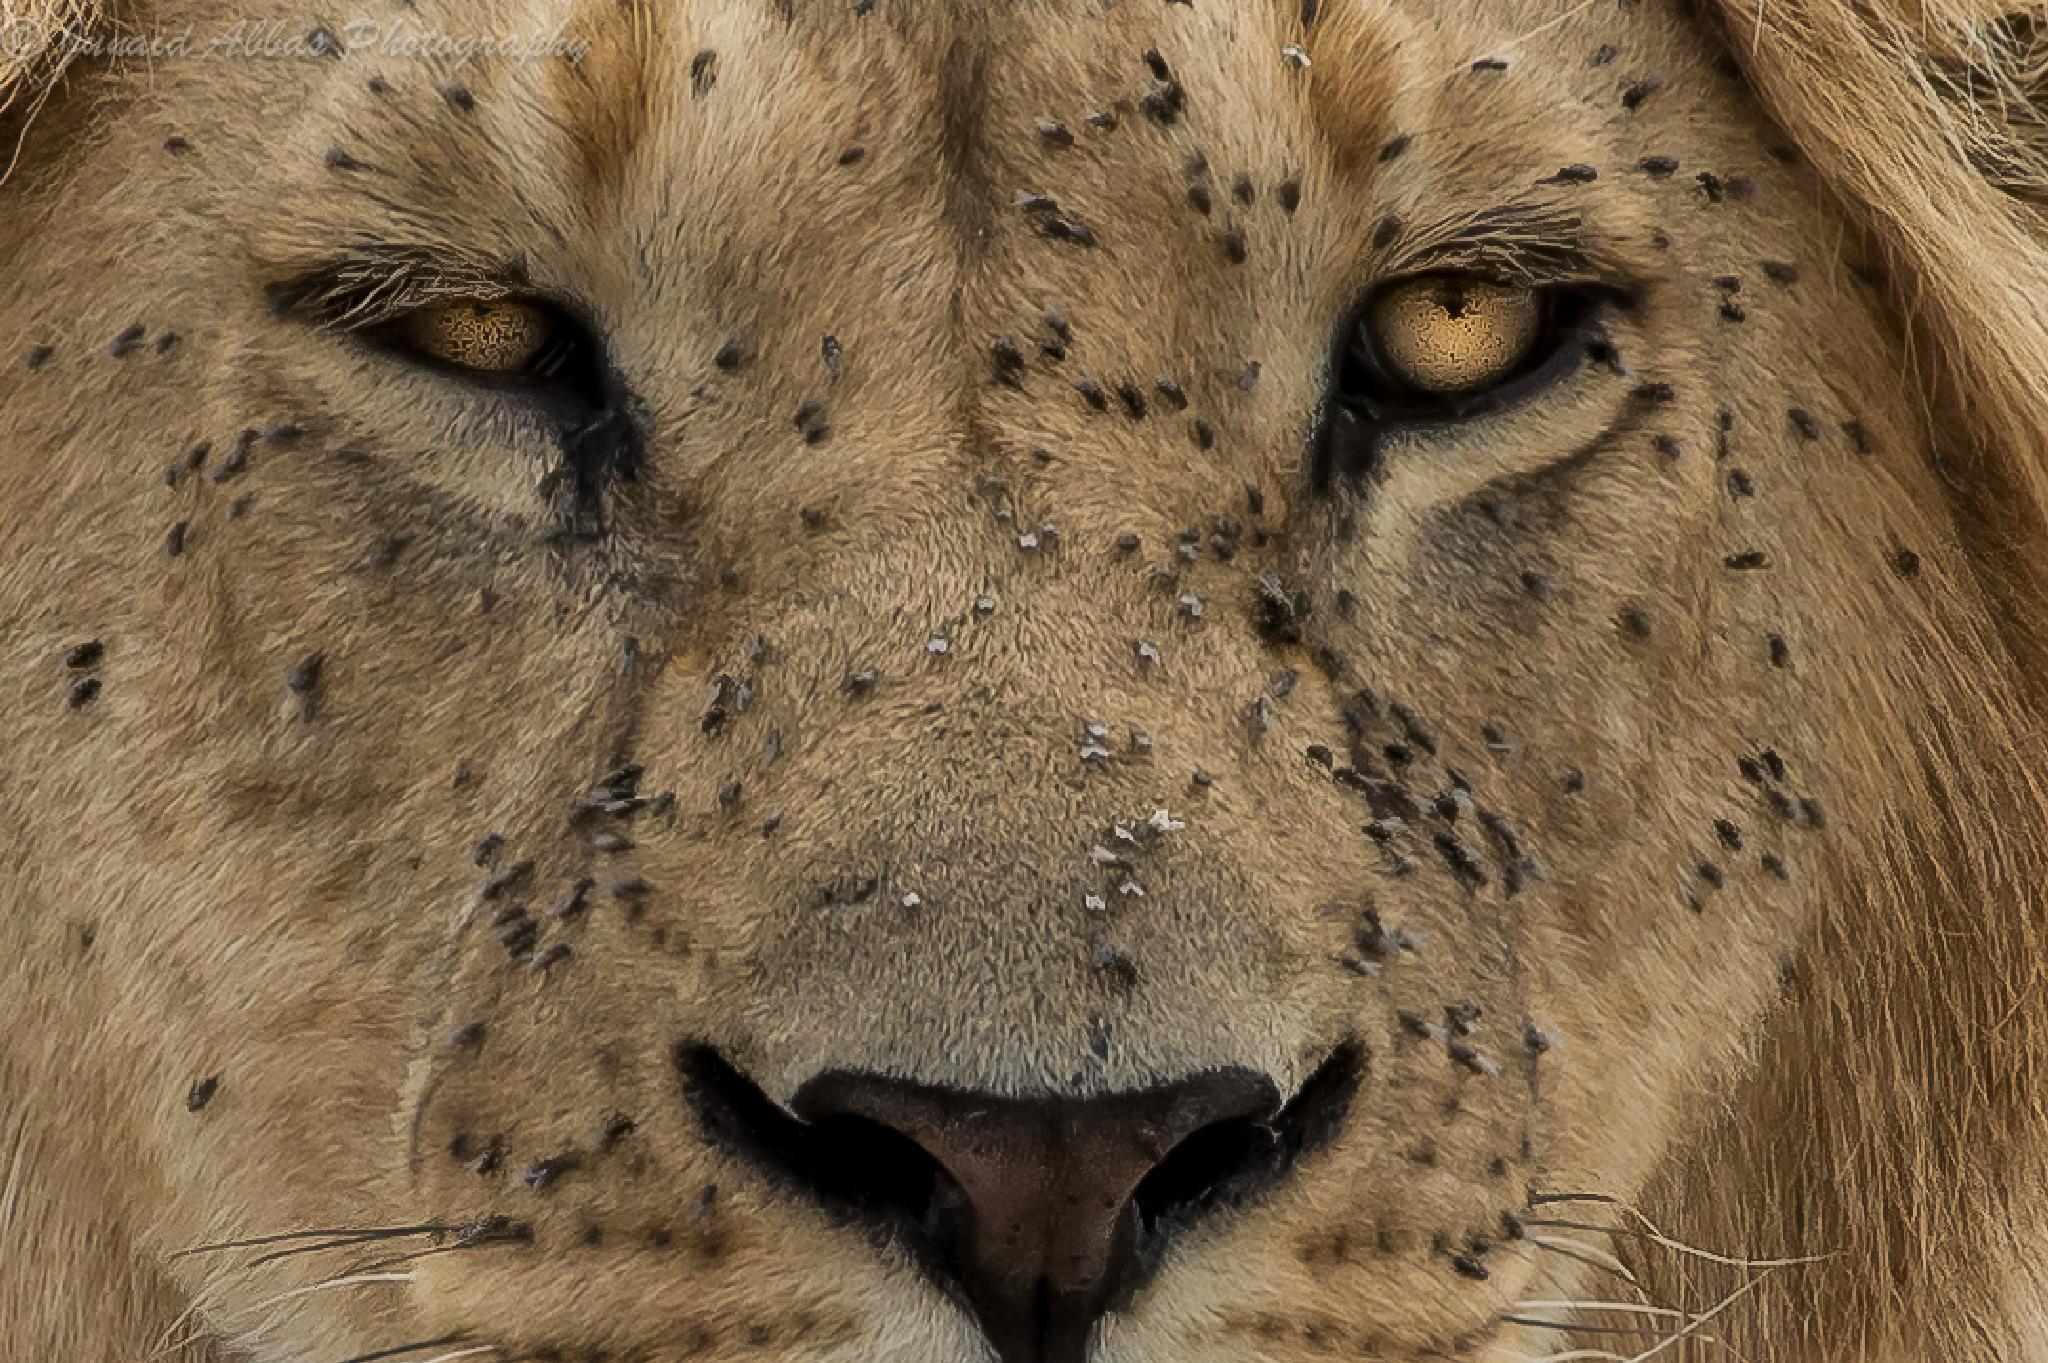 Scary Eyes by Junaid Abbas